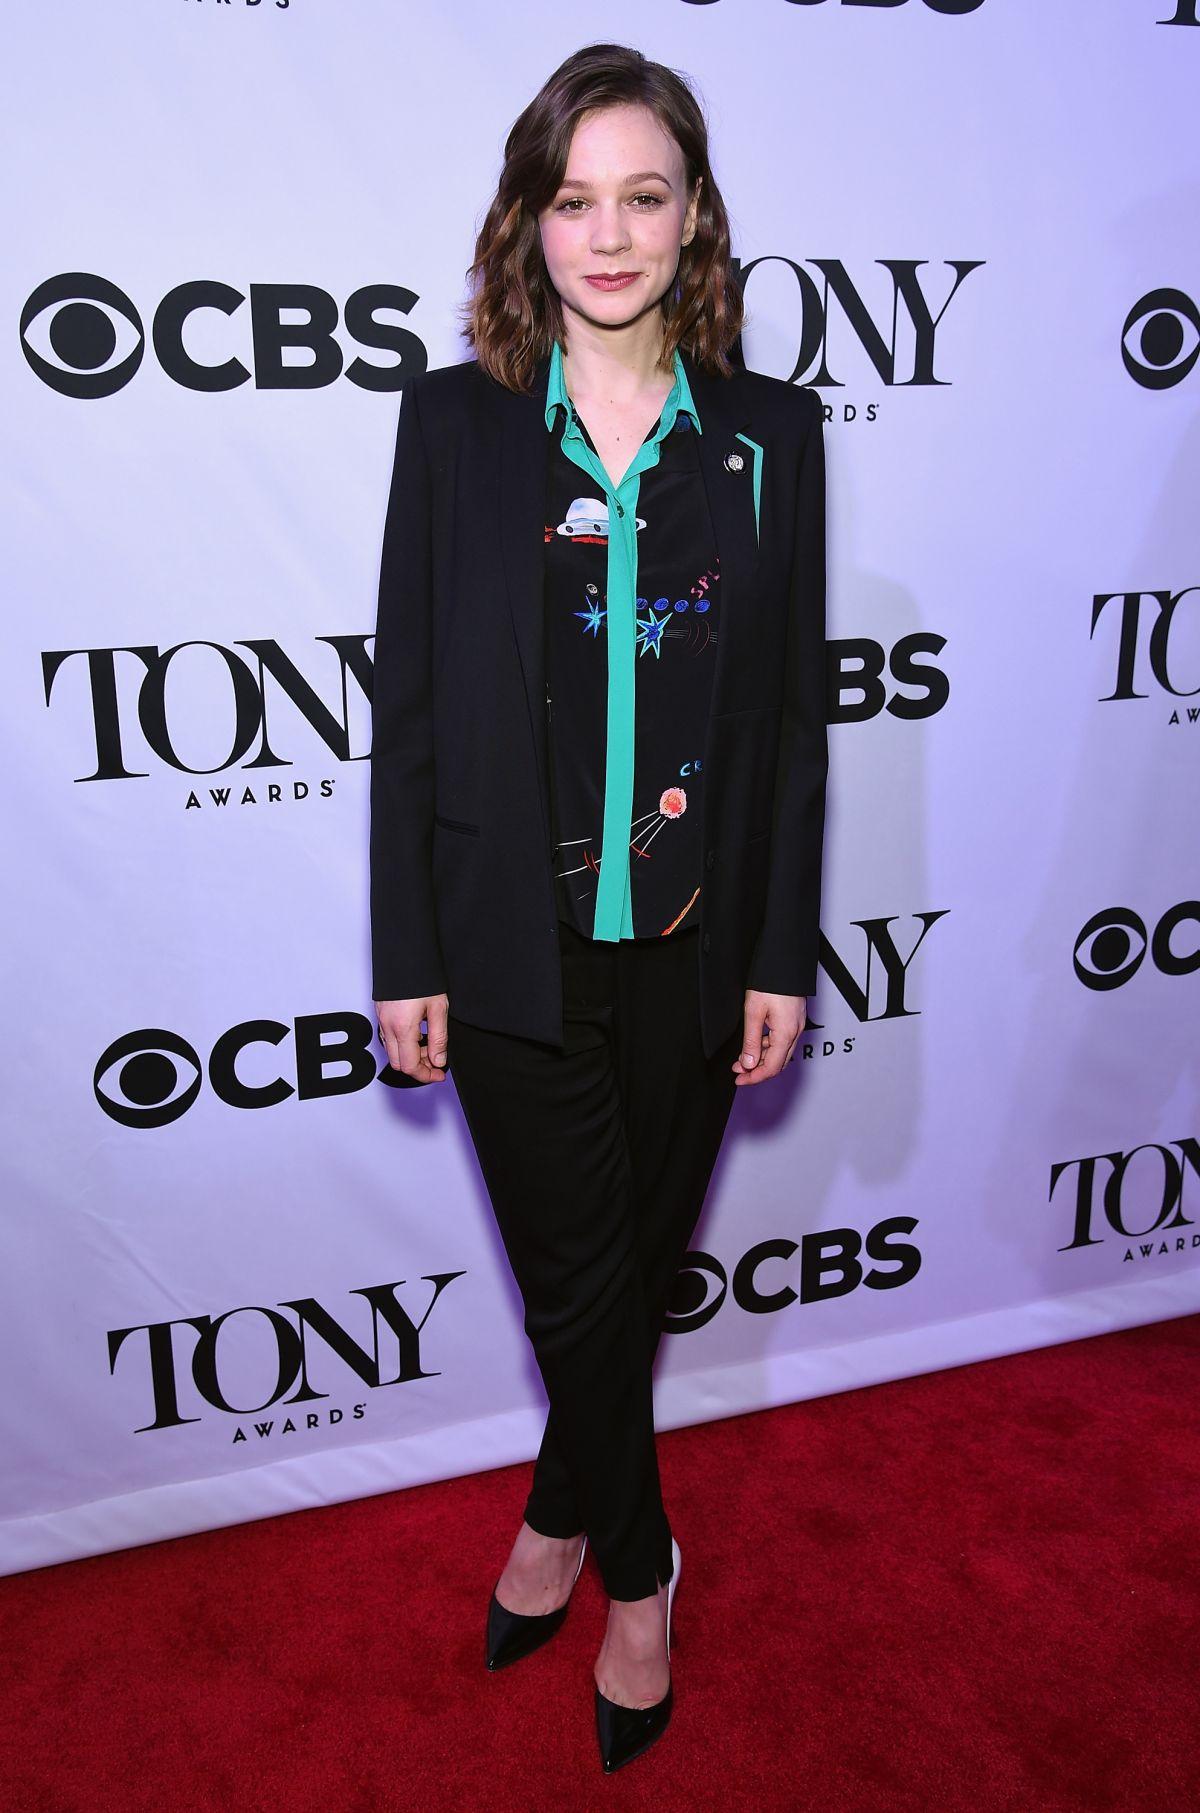 carey-mulligan-at-tony-awards-meet-the-nominees-press-reception-in-new-york_8